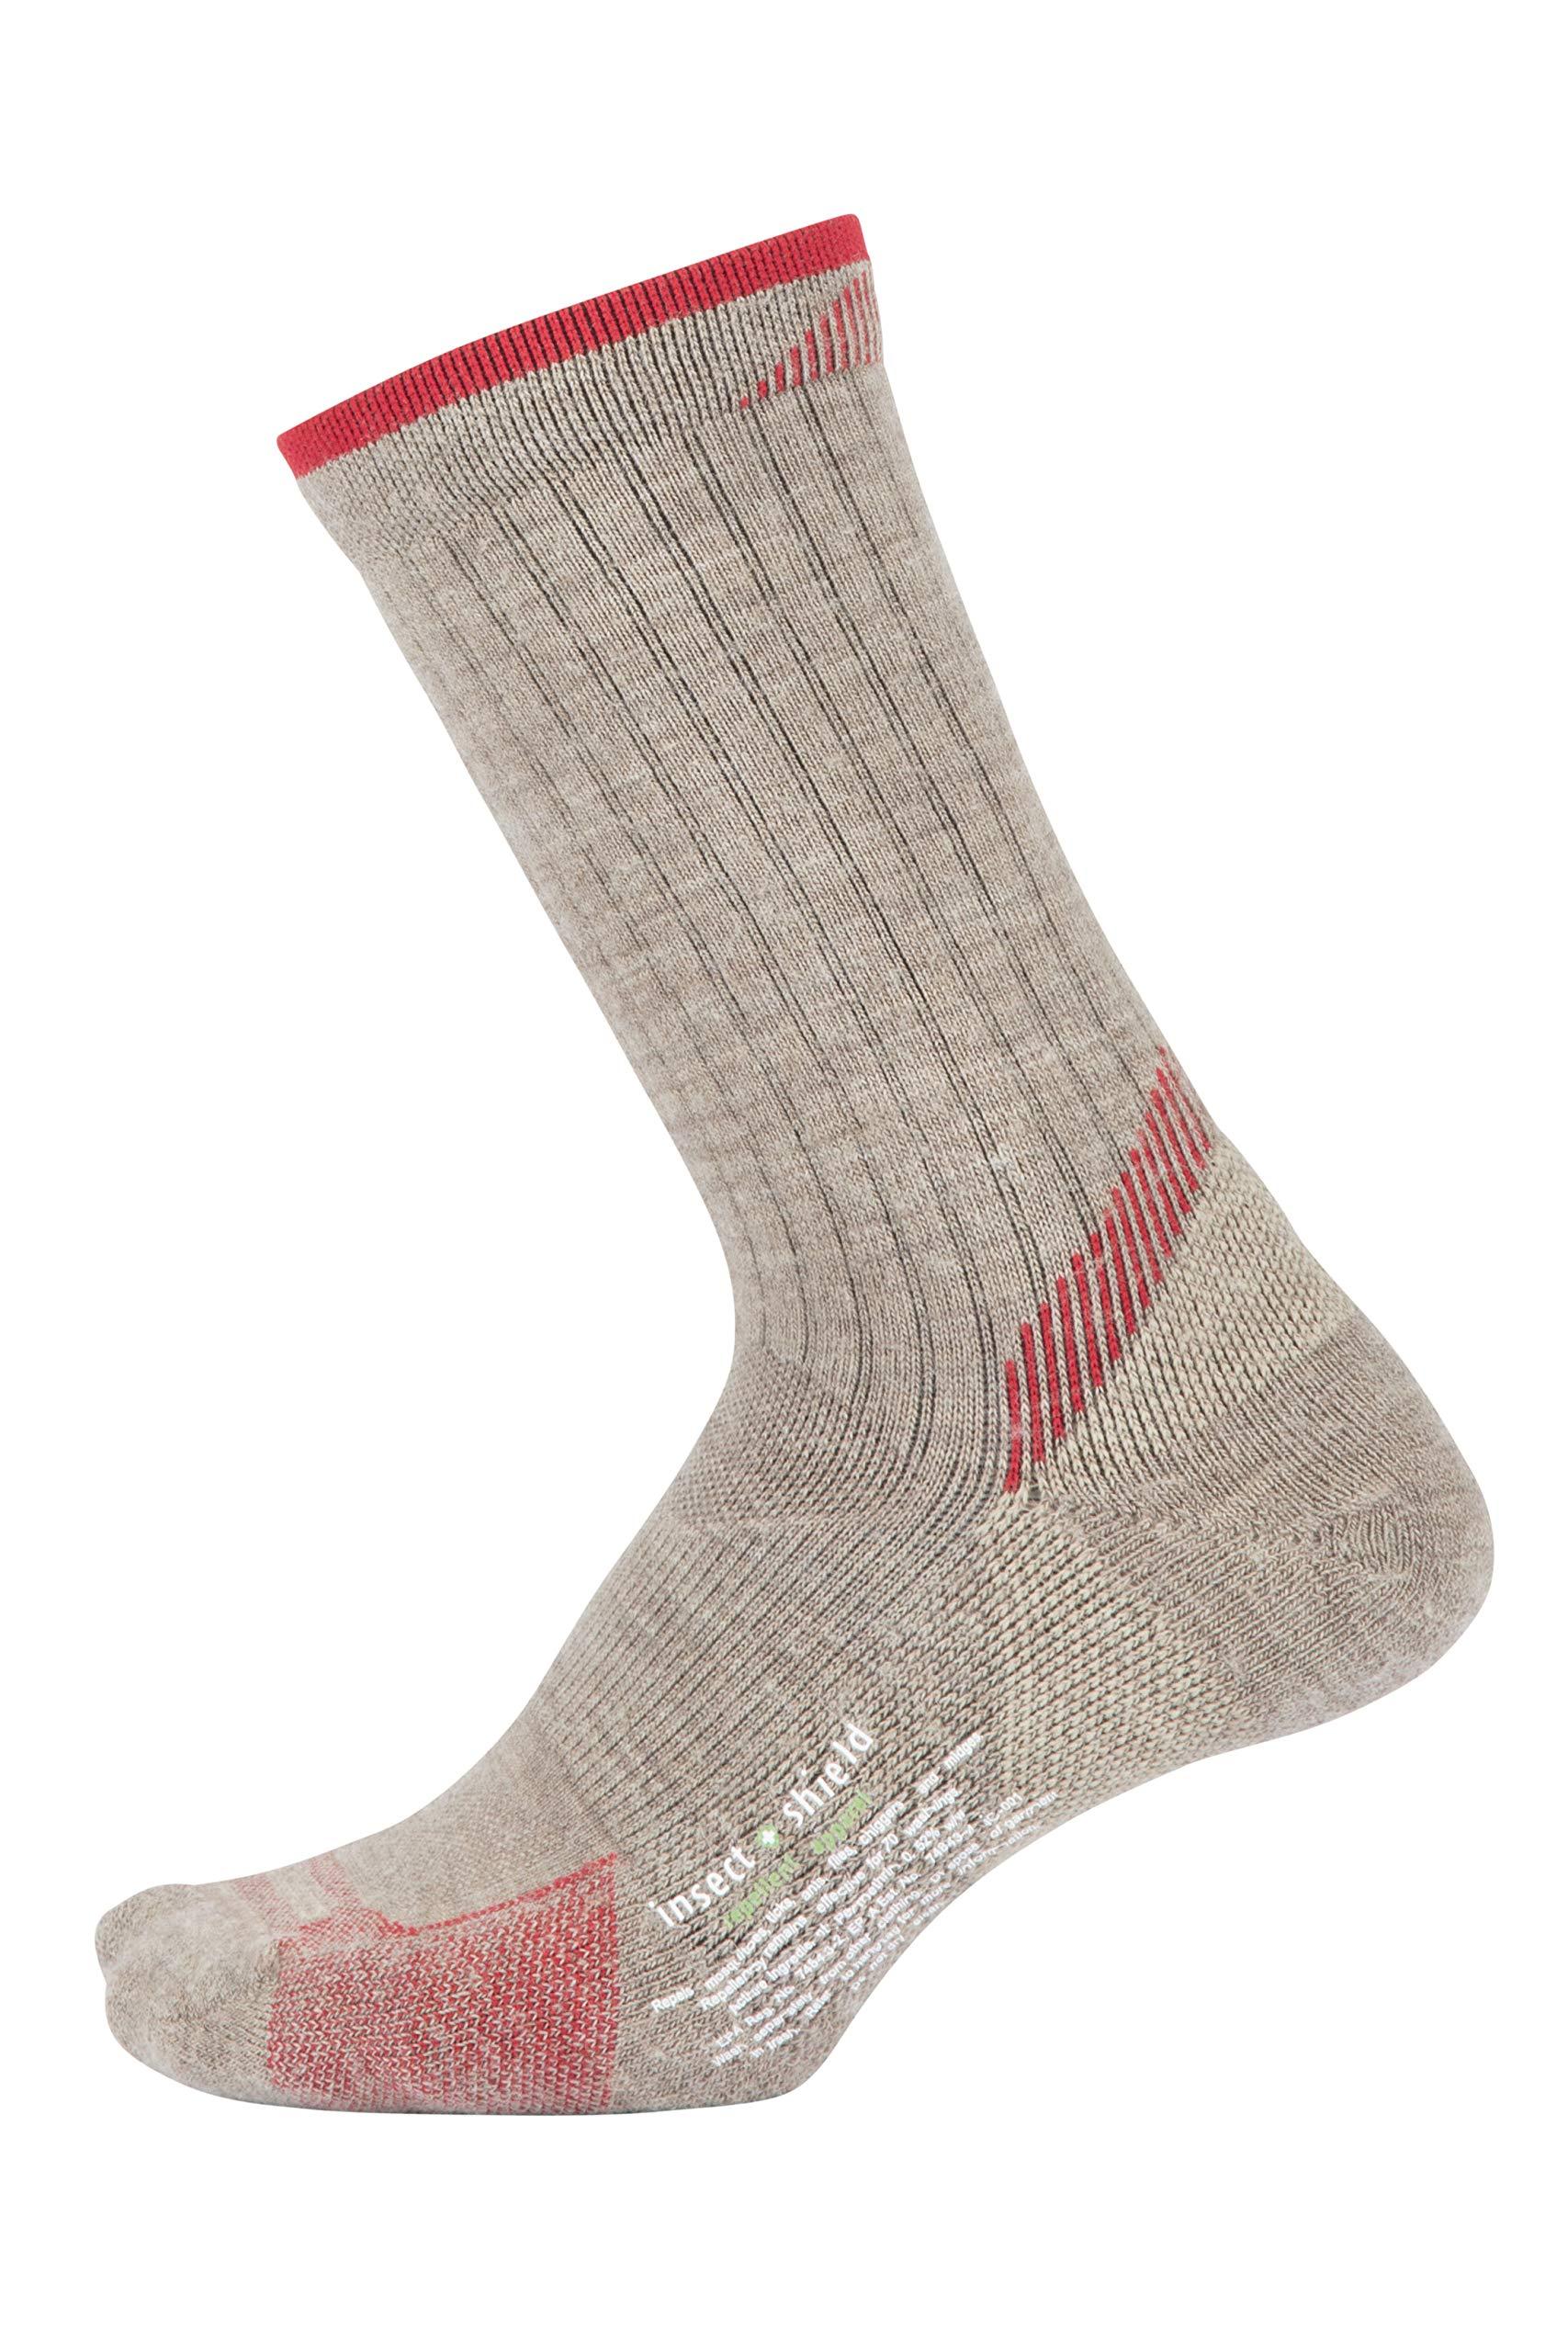 ExOfficio Women's BugsAway Solstice Canyon Crew Sock, Oatmeal Heather/Lollipop, Small/Medium by ExOfficio